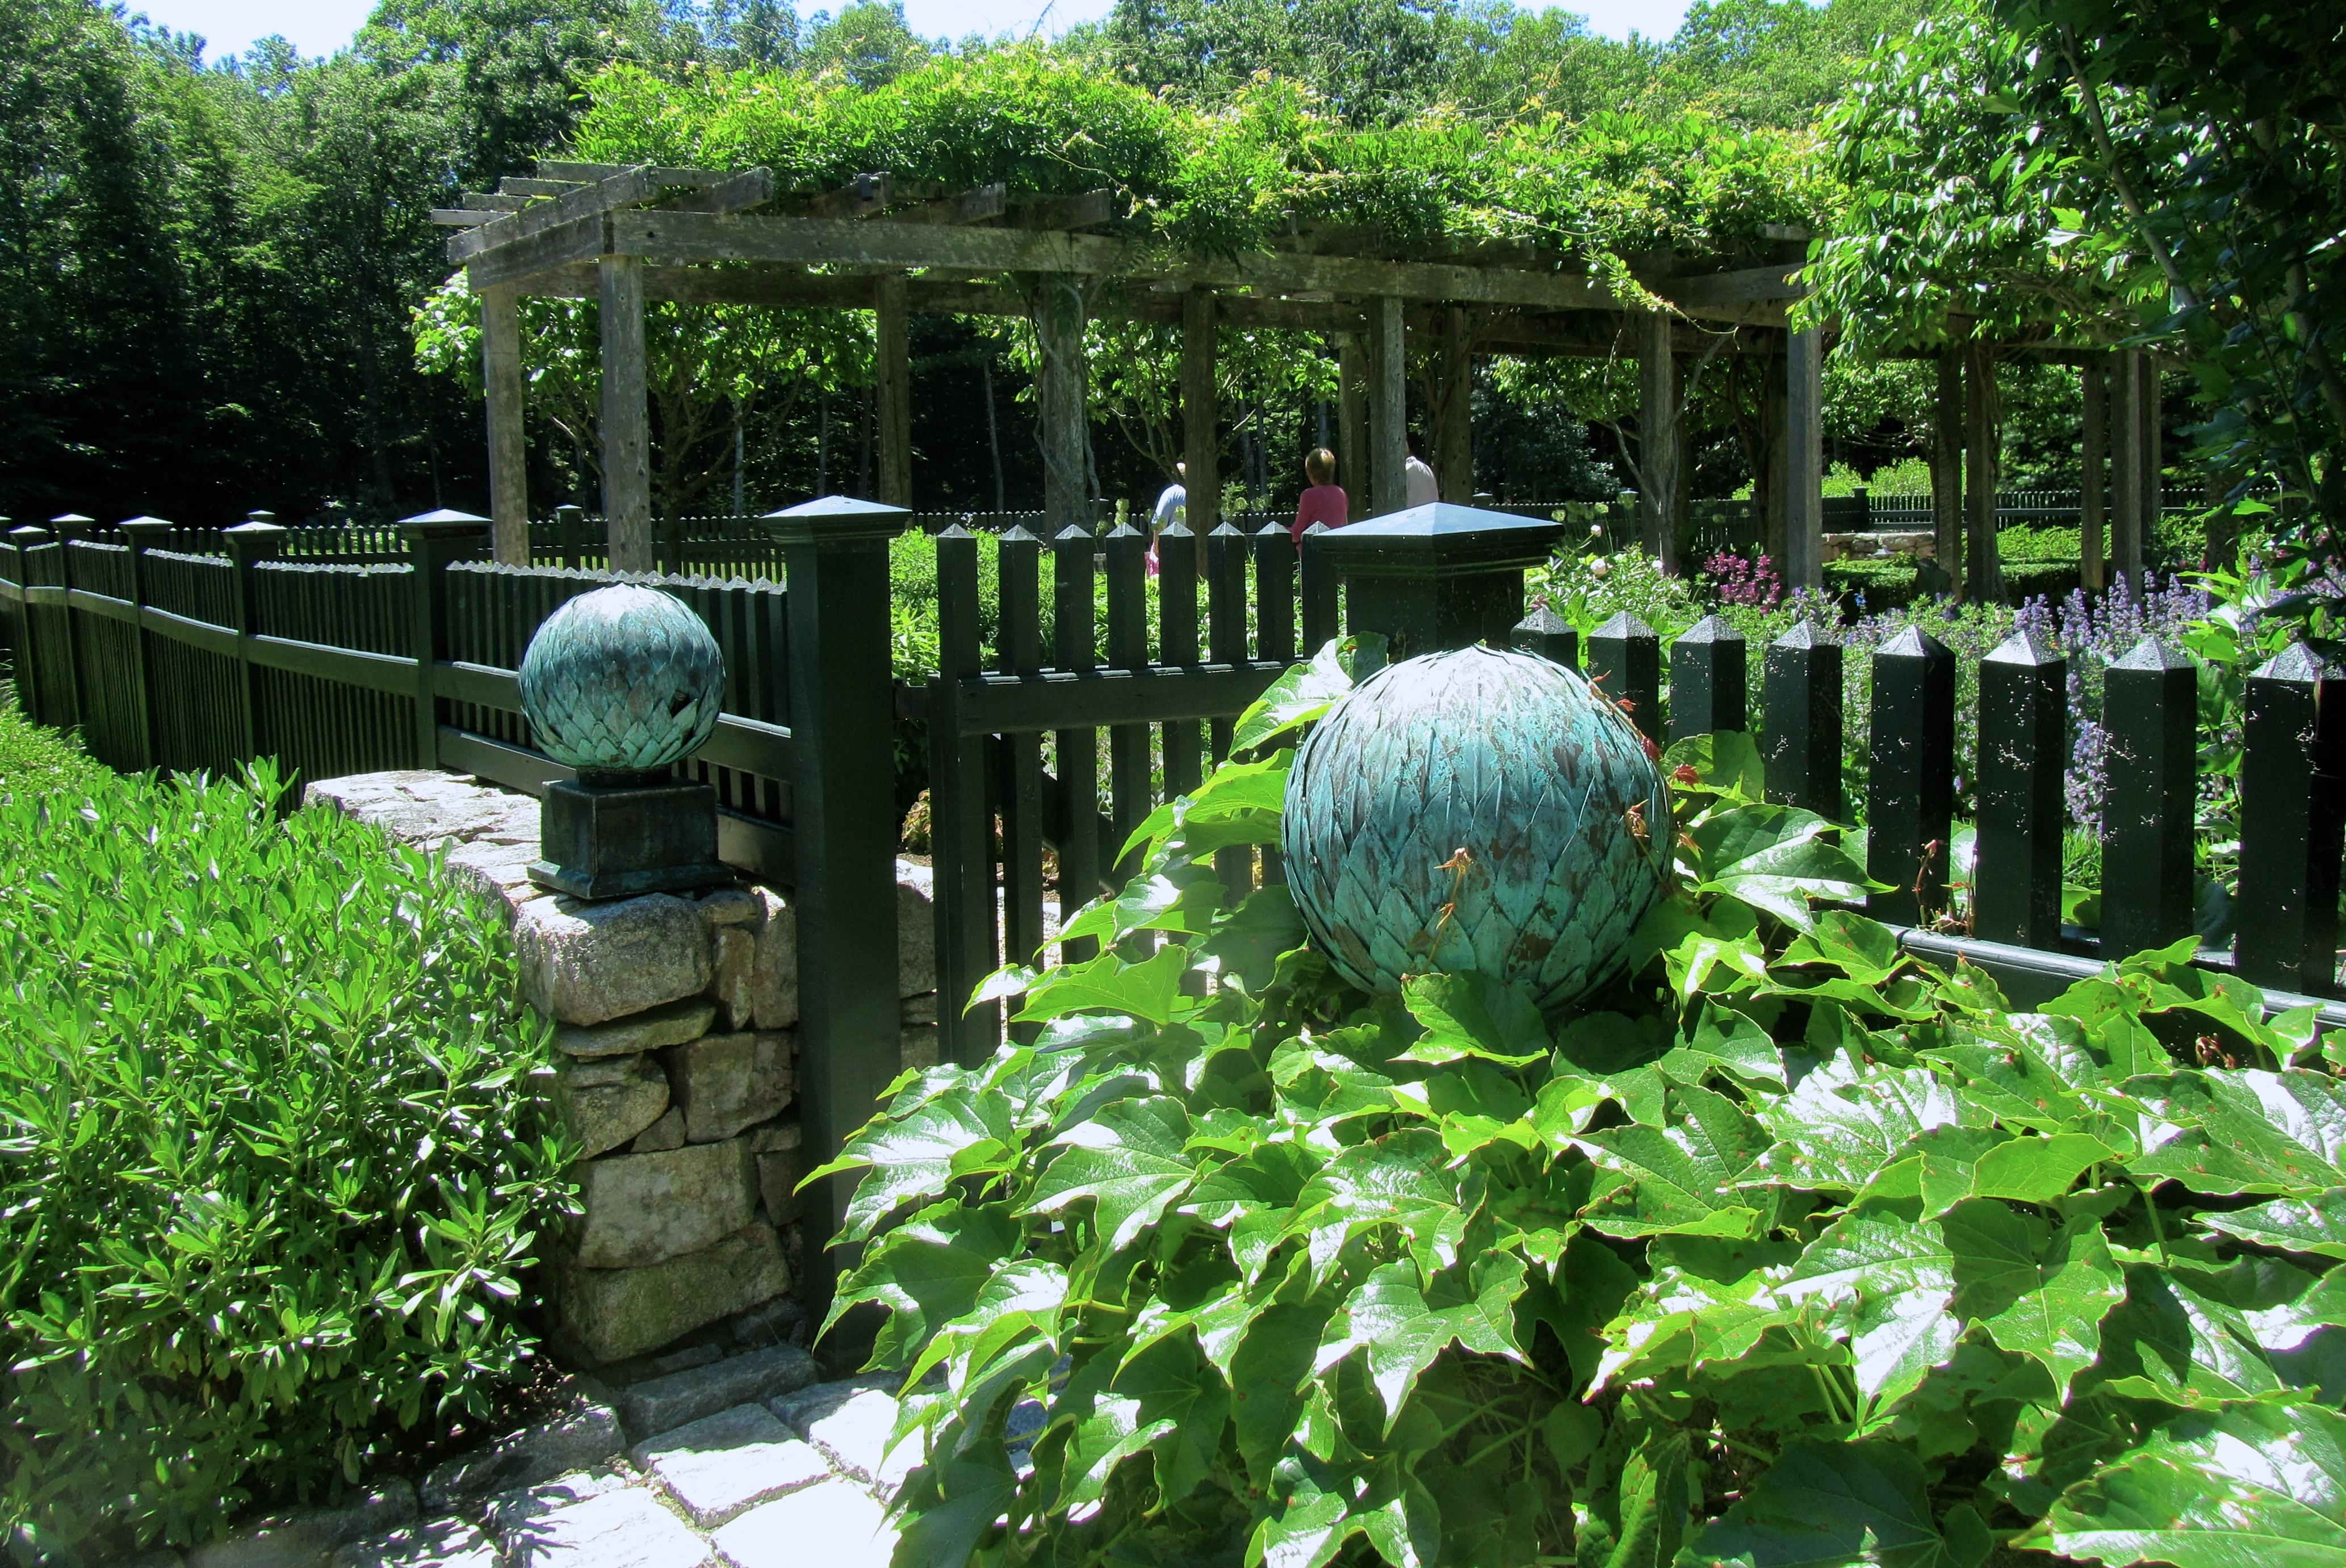 Garden Conservancy S Open Days 2014 Breaking New Ground In Zone 6